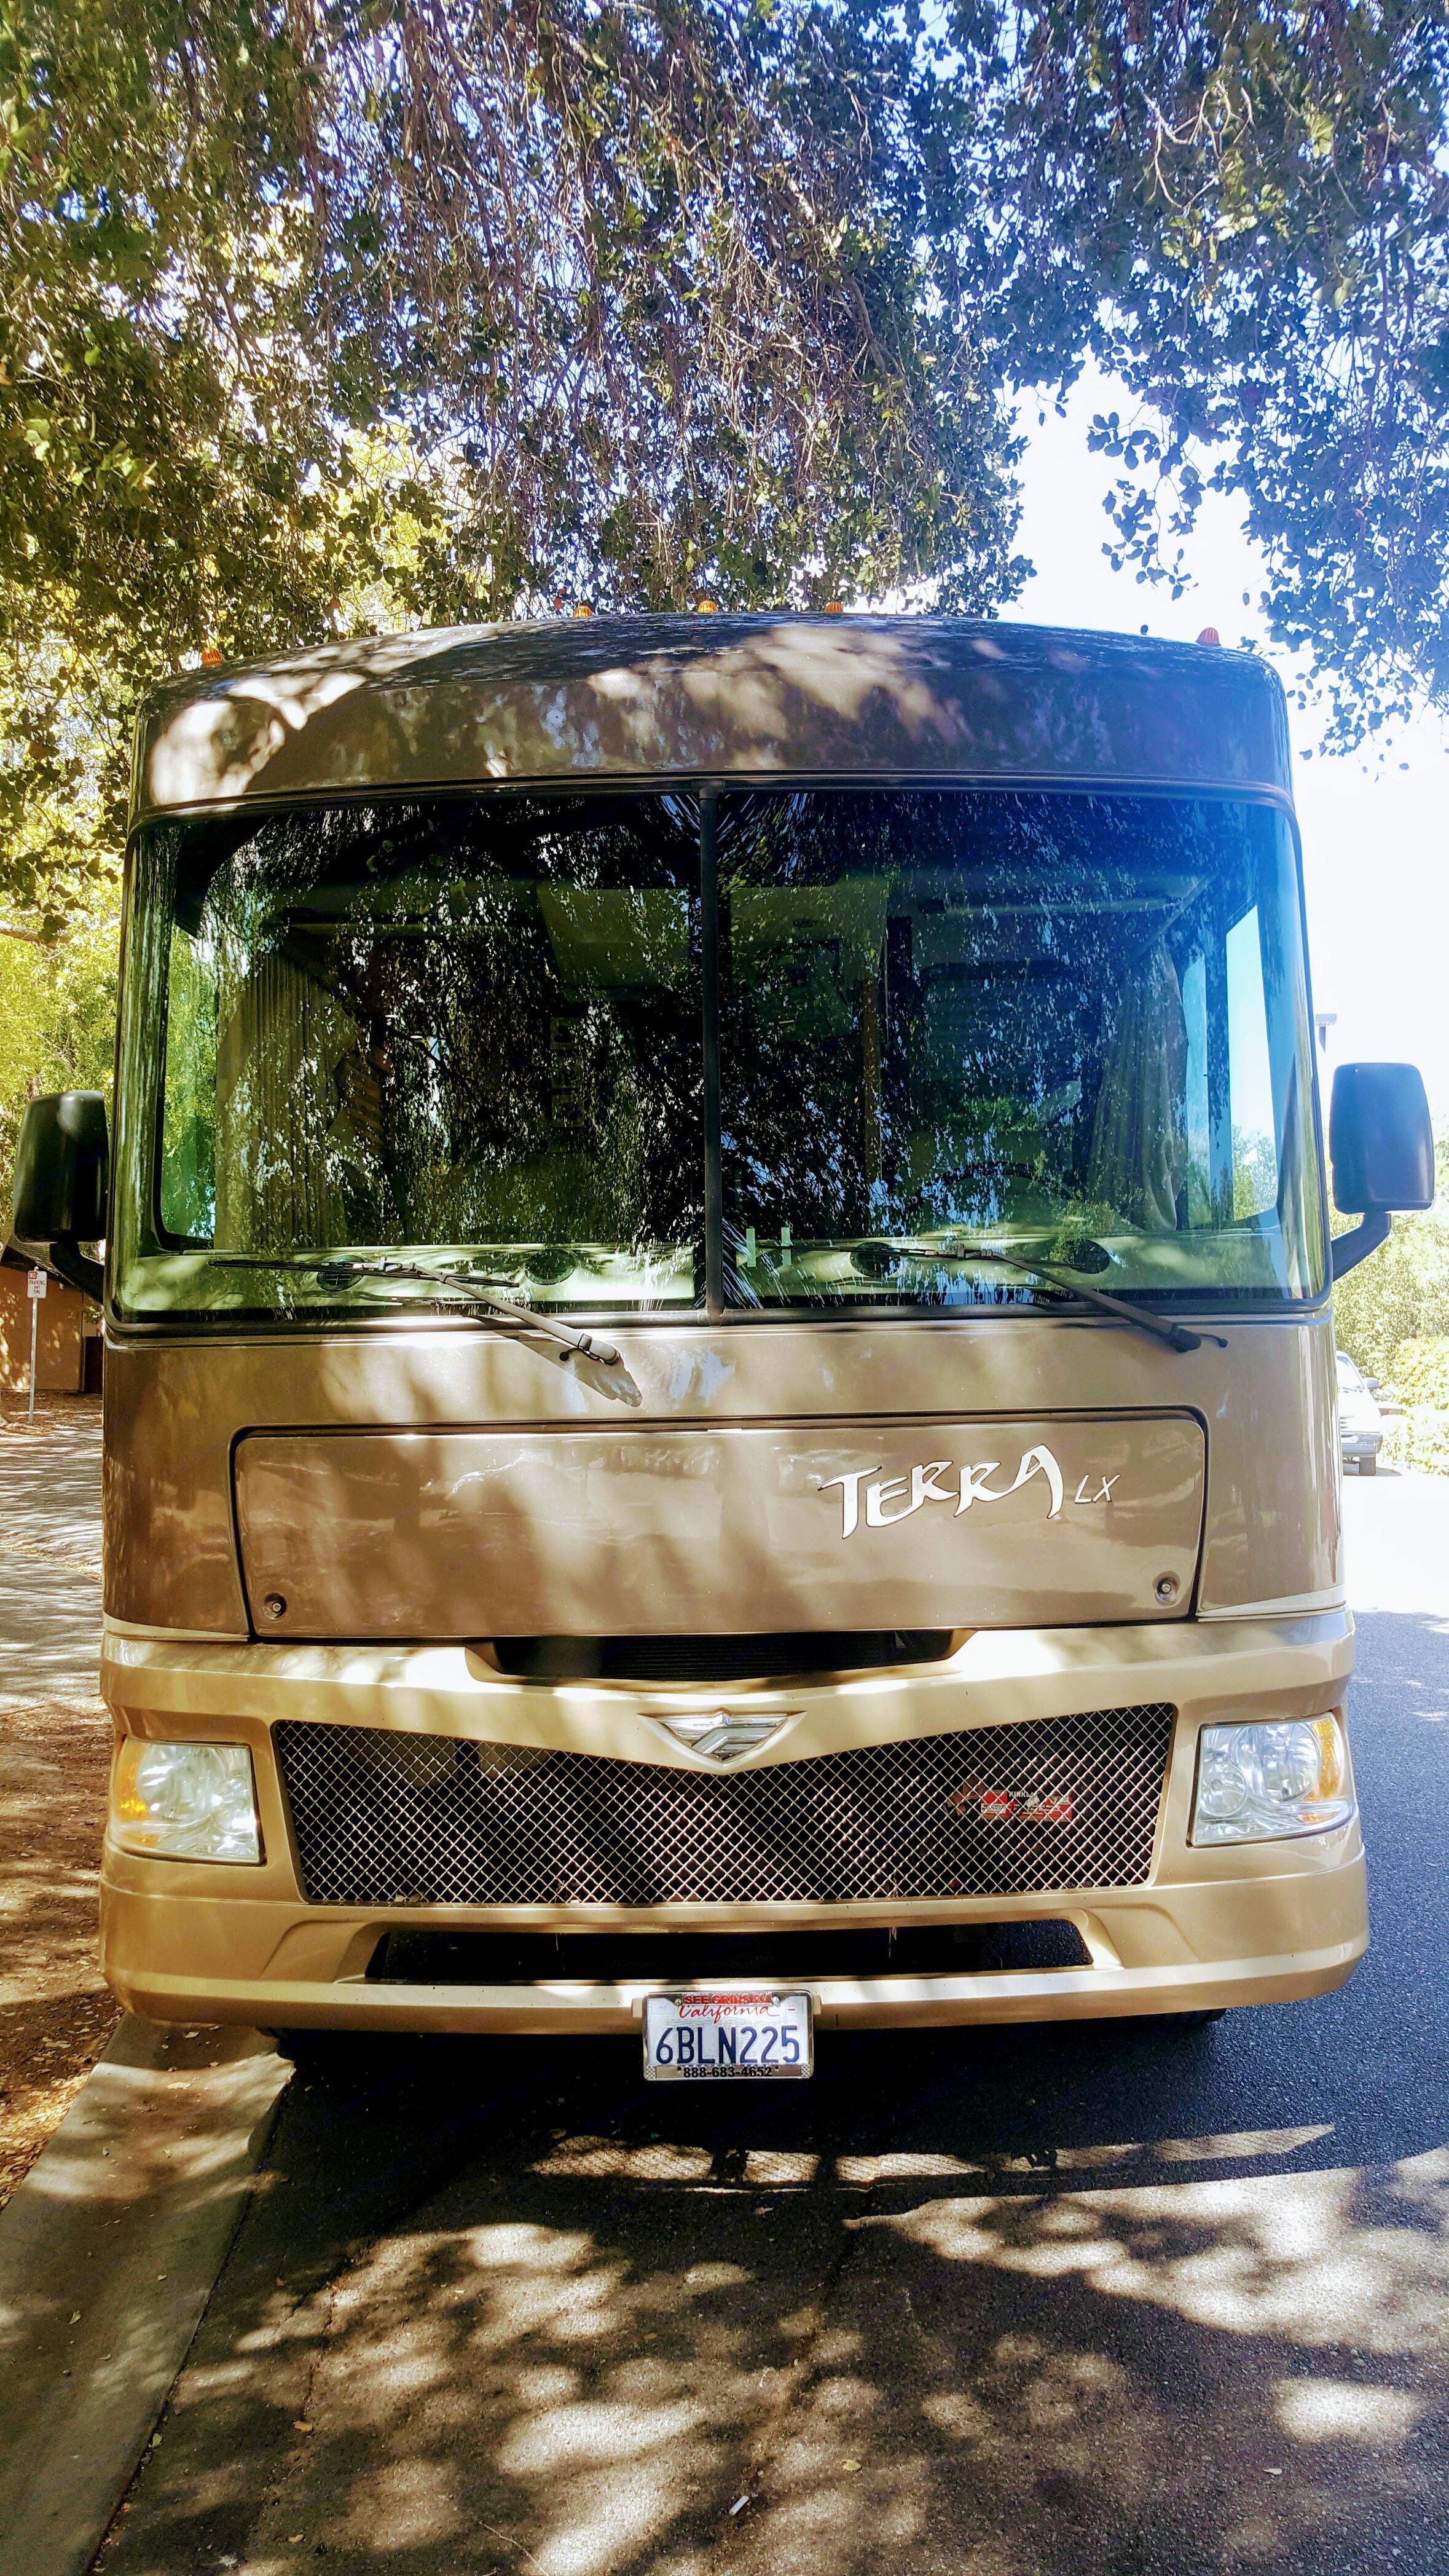 Fleetwood Terra 2008